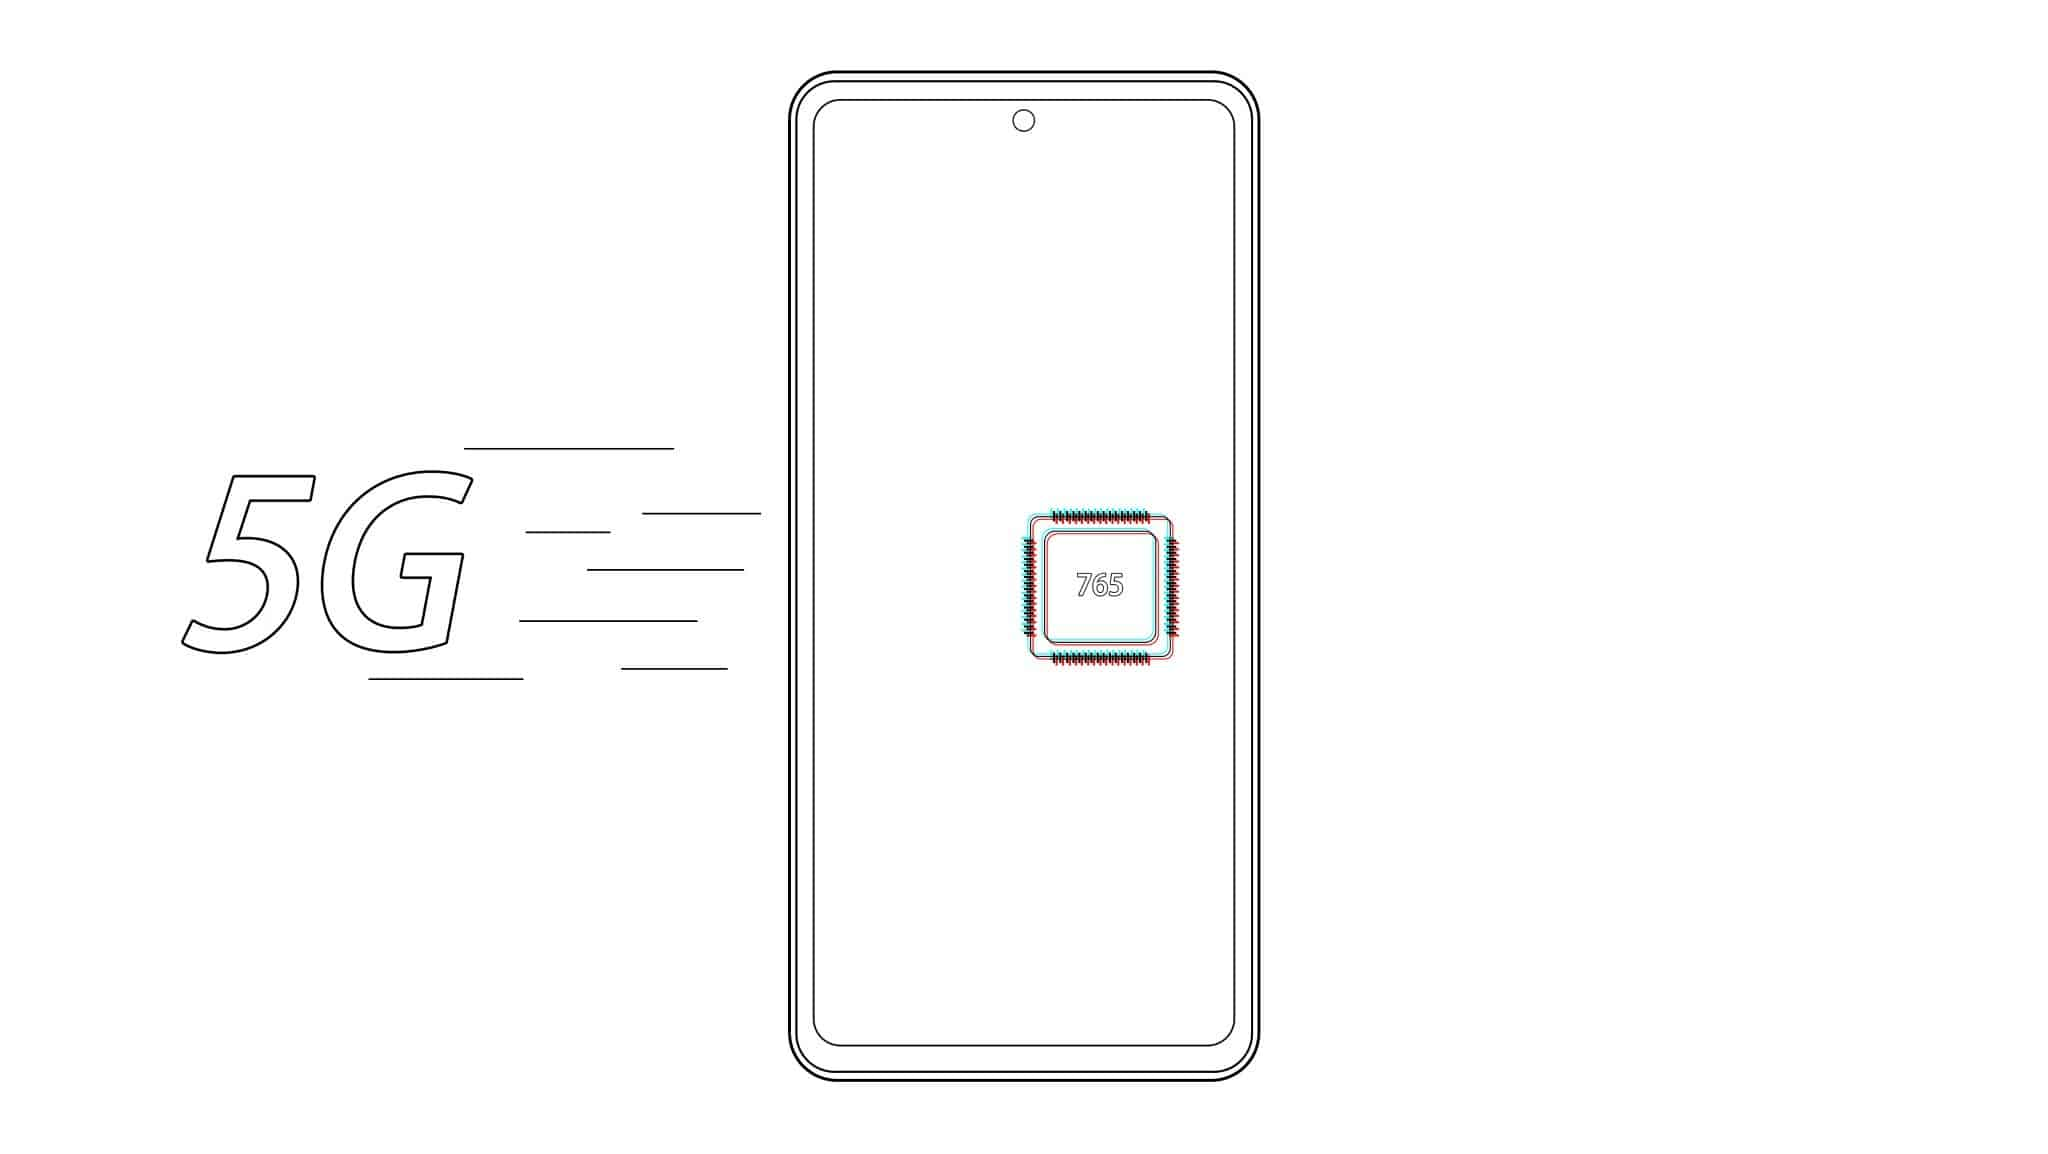 OnePlus Z Snapdragon